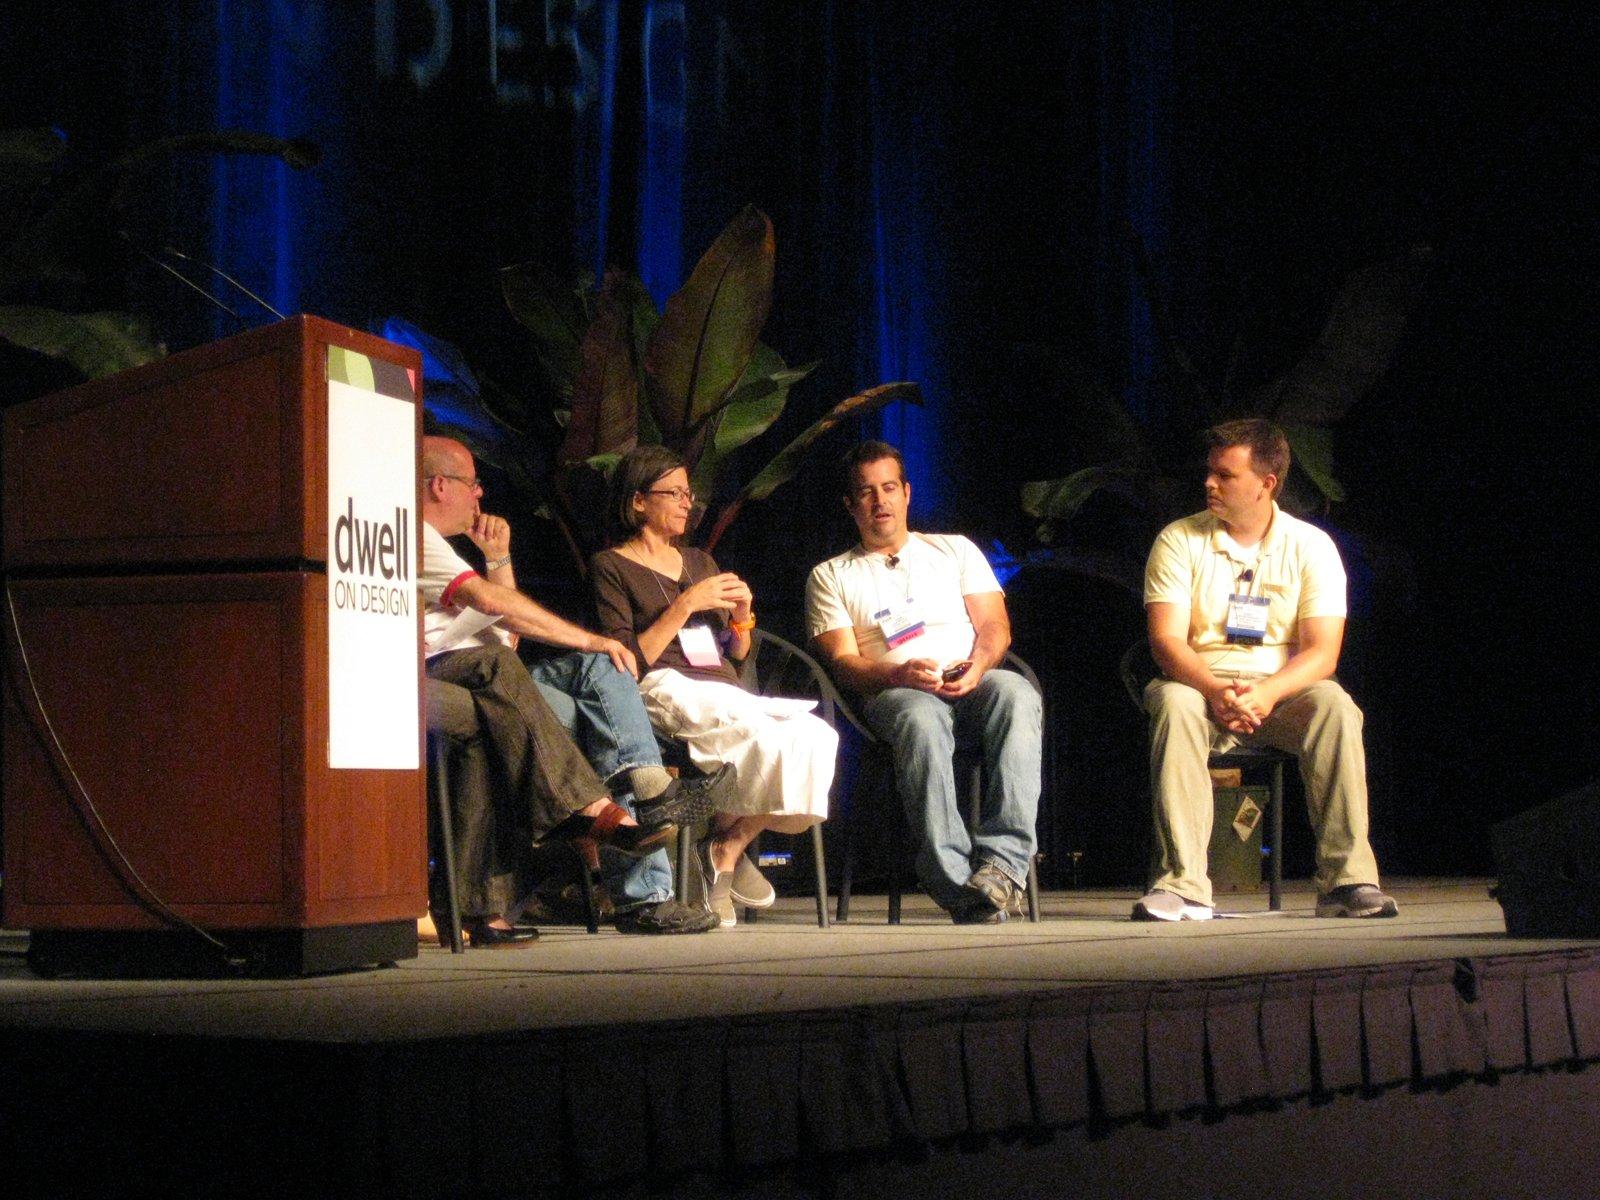 Photo 1 of 1 in Panel: Density in Los Angeles